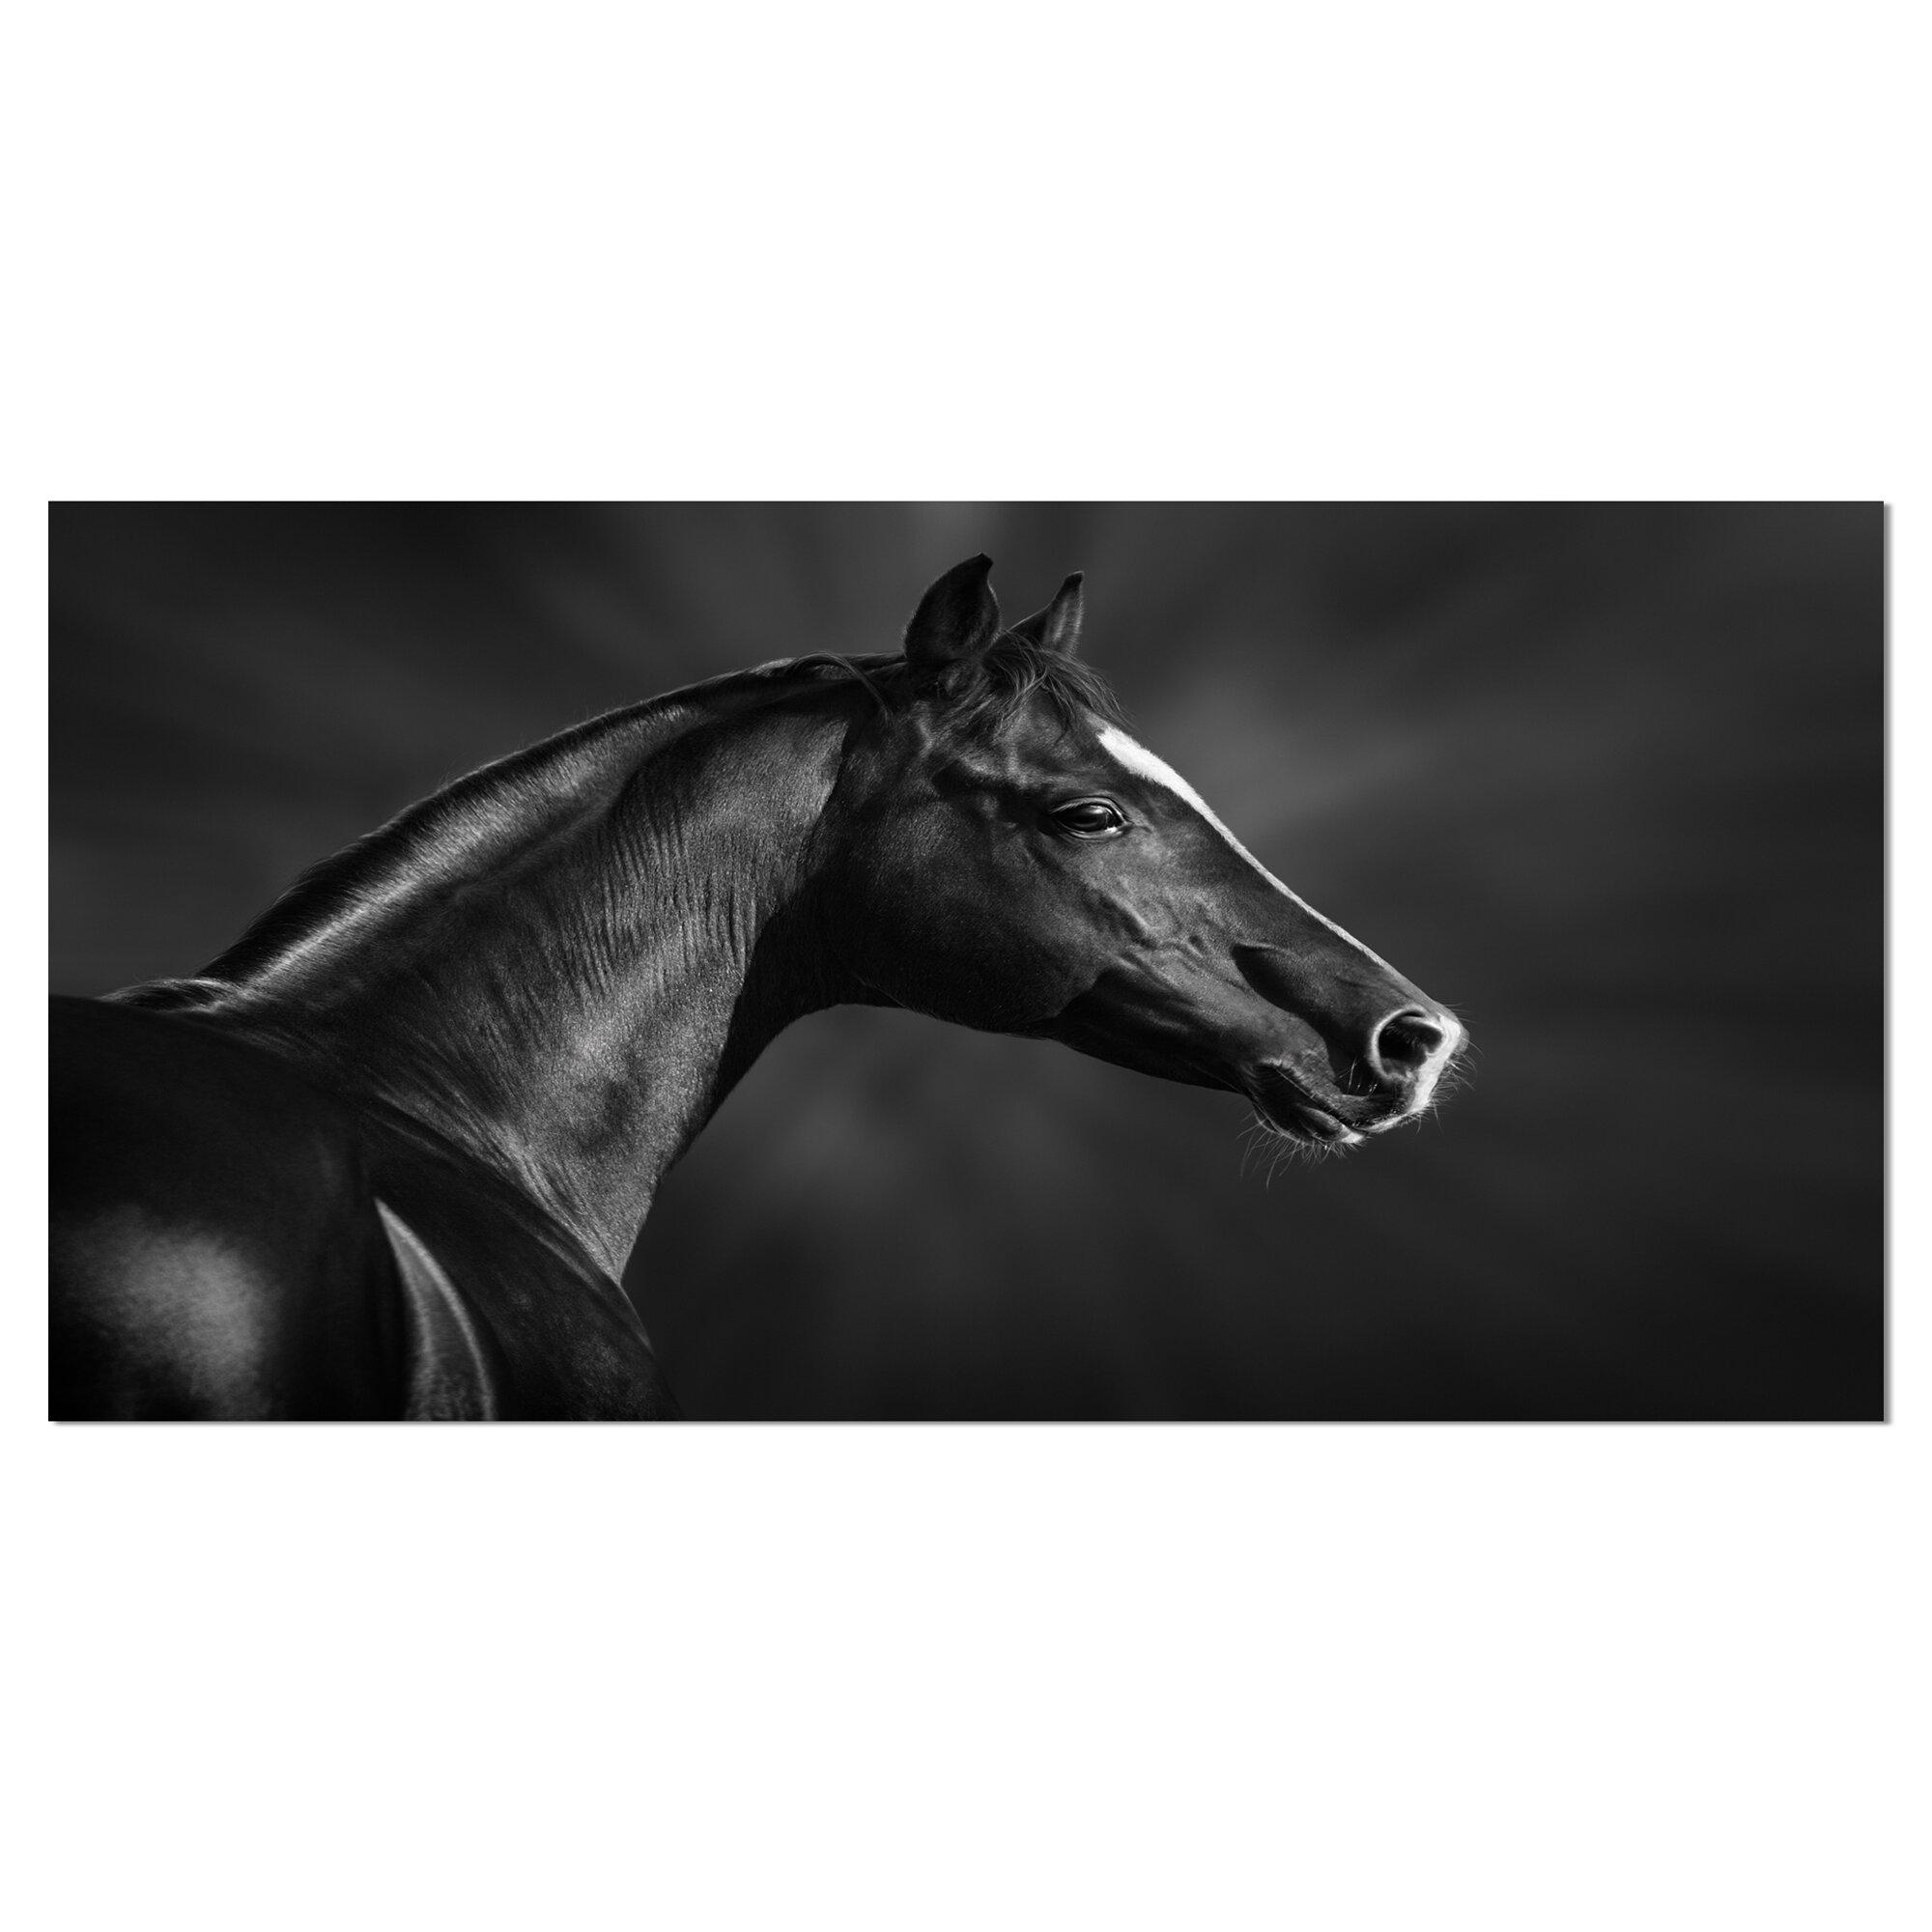 Designart Black Arabian Horse Portrait Photographic Print On Wrapped Canvas